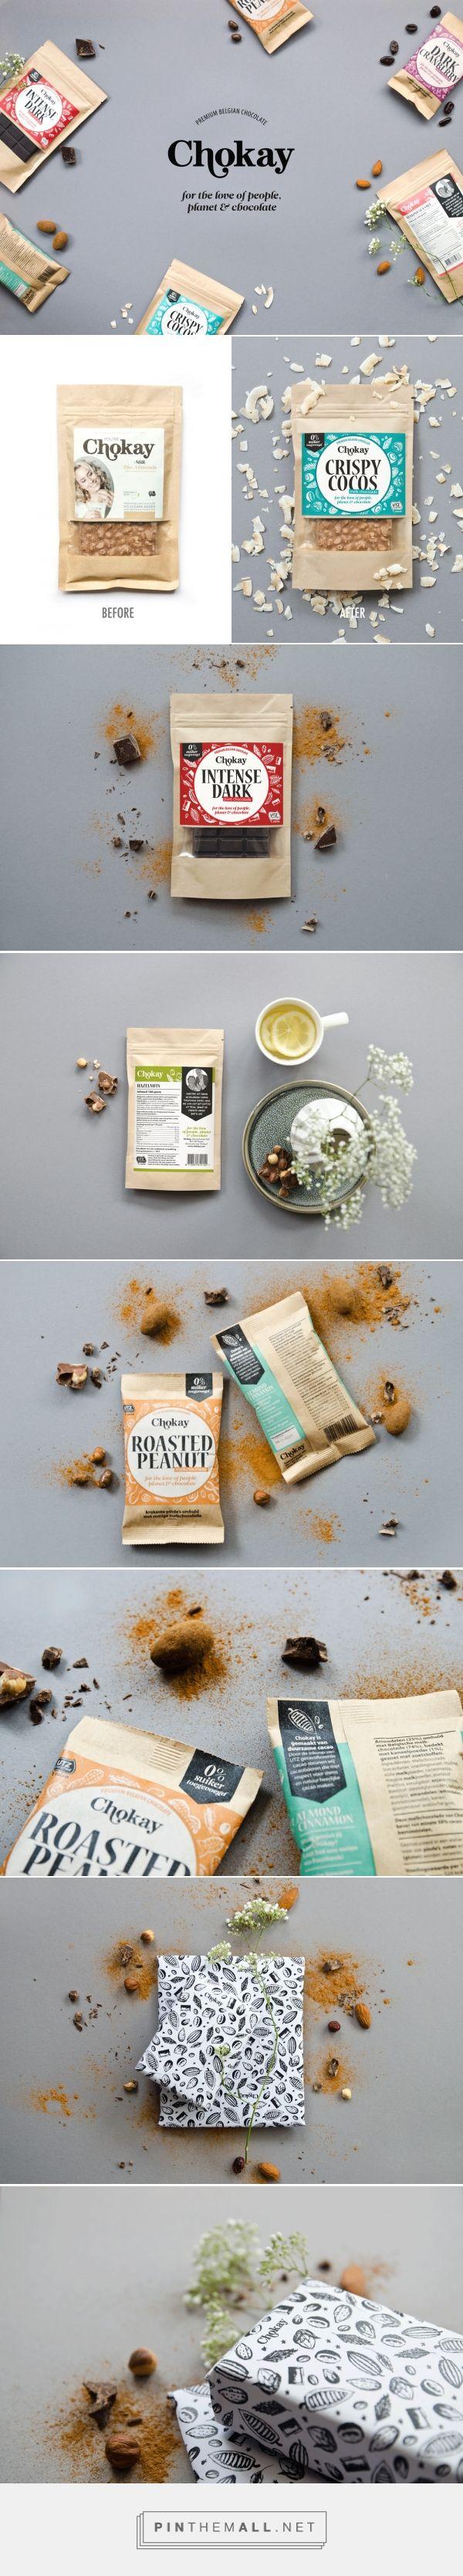 Chokay snacks - Packaging of the World - Creative Package Design Gallery - http://www.packagingoftheworld.com/2017/04/chokay.html